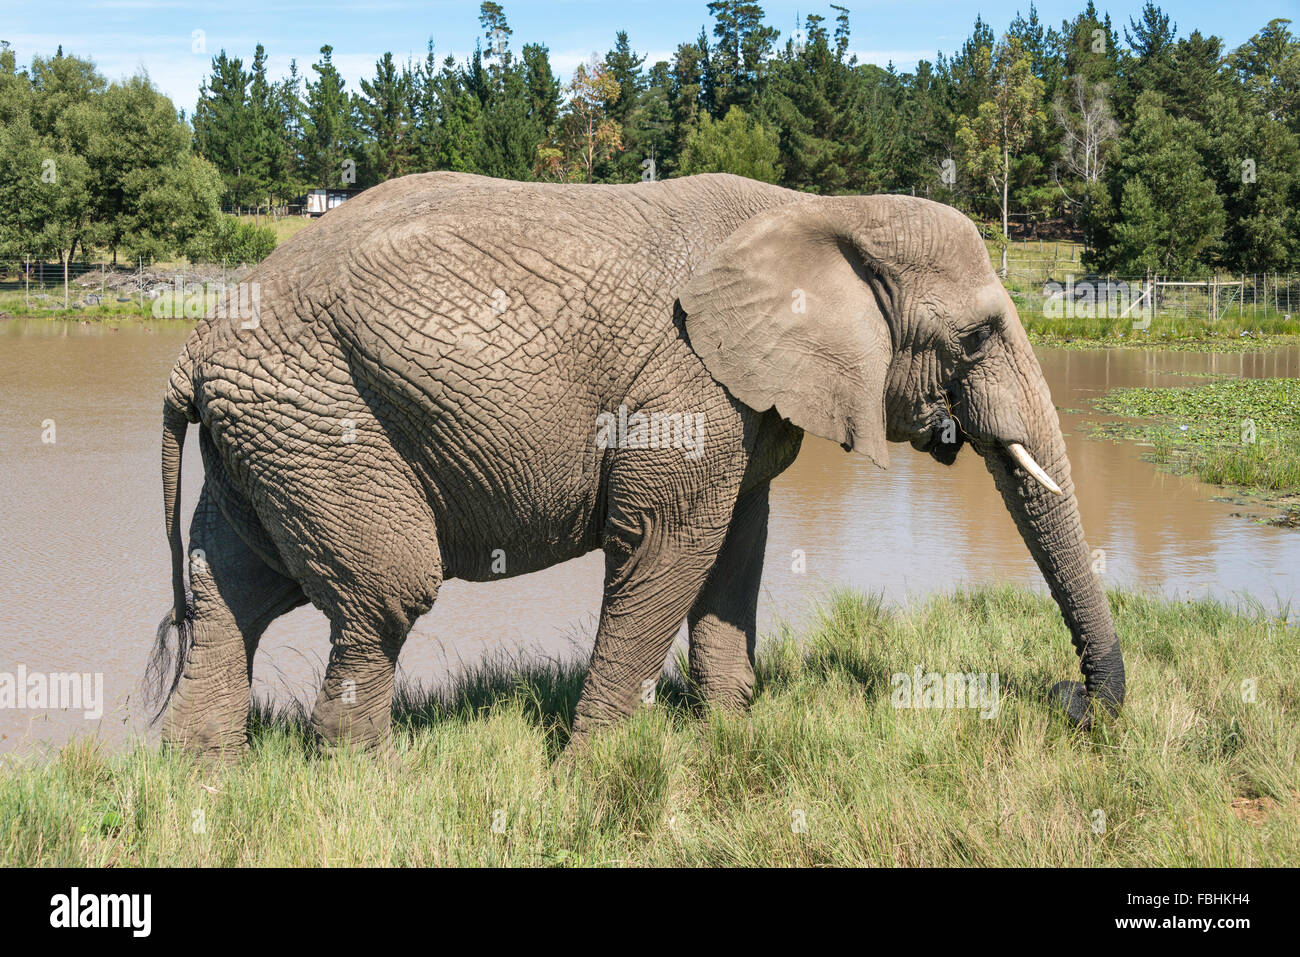 Male elephant at Knysna Elephant Park, Plettenberg Bay, Knysna, Knysna Municipality, Western Cape Province, Republic - Stock Image